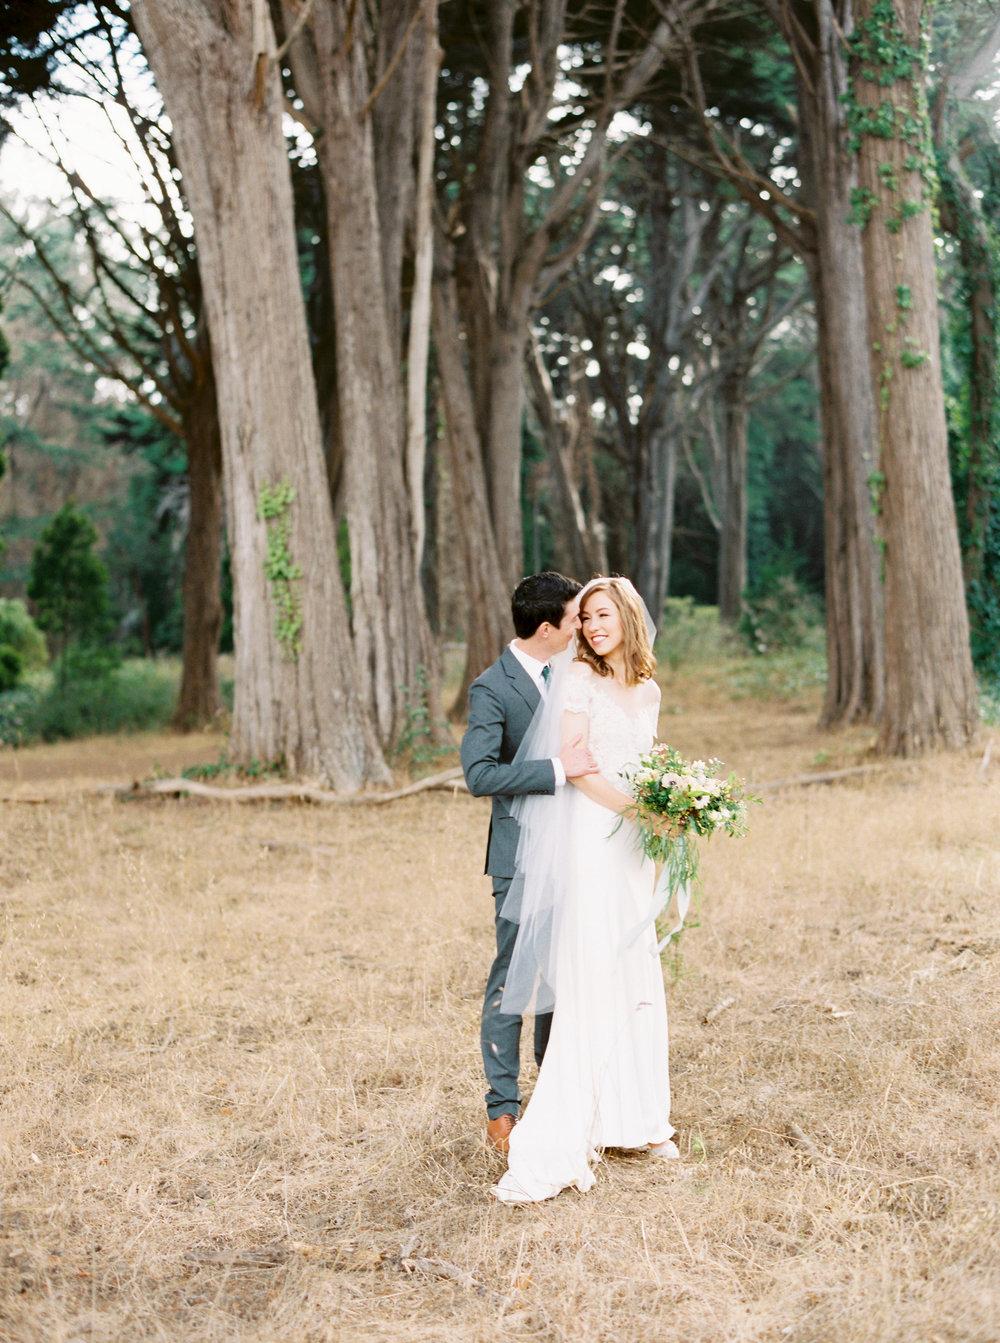 Log-cabin-wedding-in-presidio-san-francisco-california-desintation-wedding-photography-85.jpg